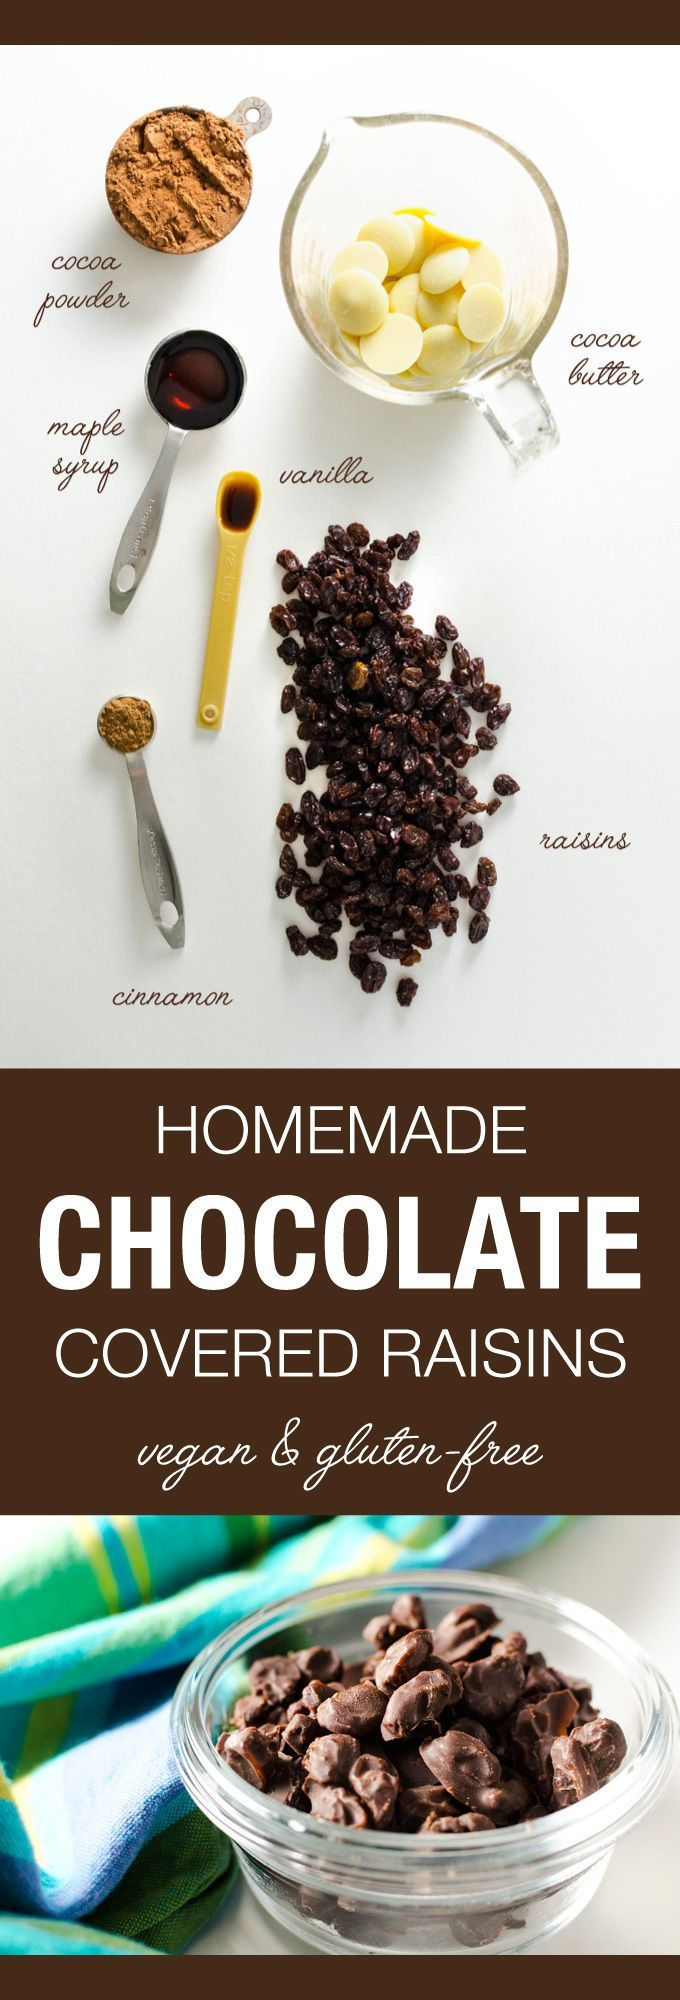 Homemade Chocolate Covered Raisins - this super easy vegan gluten-free recipe combines the pure rich flavor of homemade chocolate with the naturally sweet taste of raisins   VeggiePrimer.com